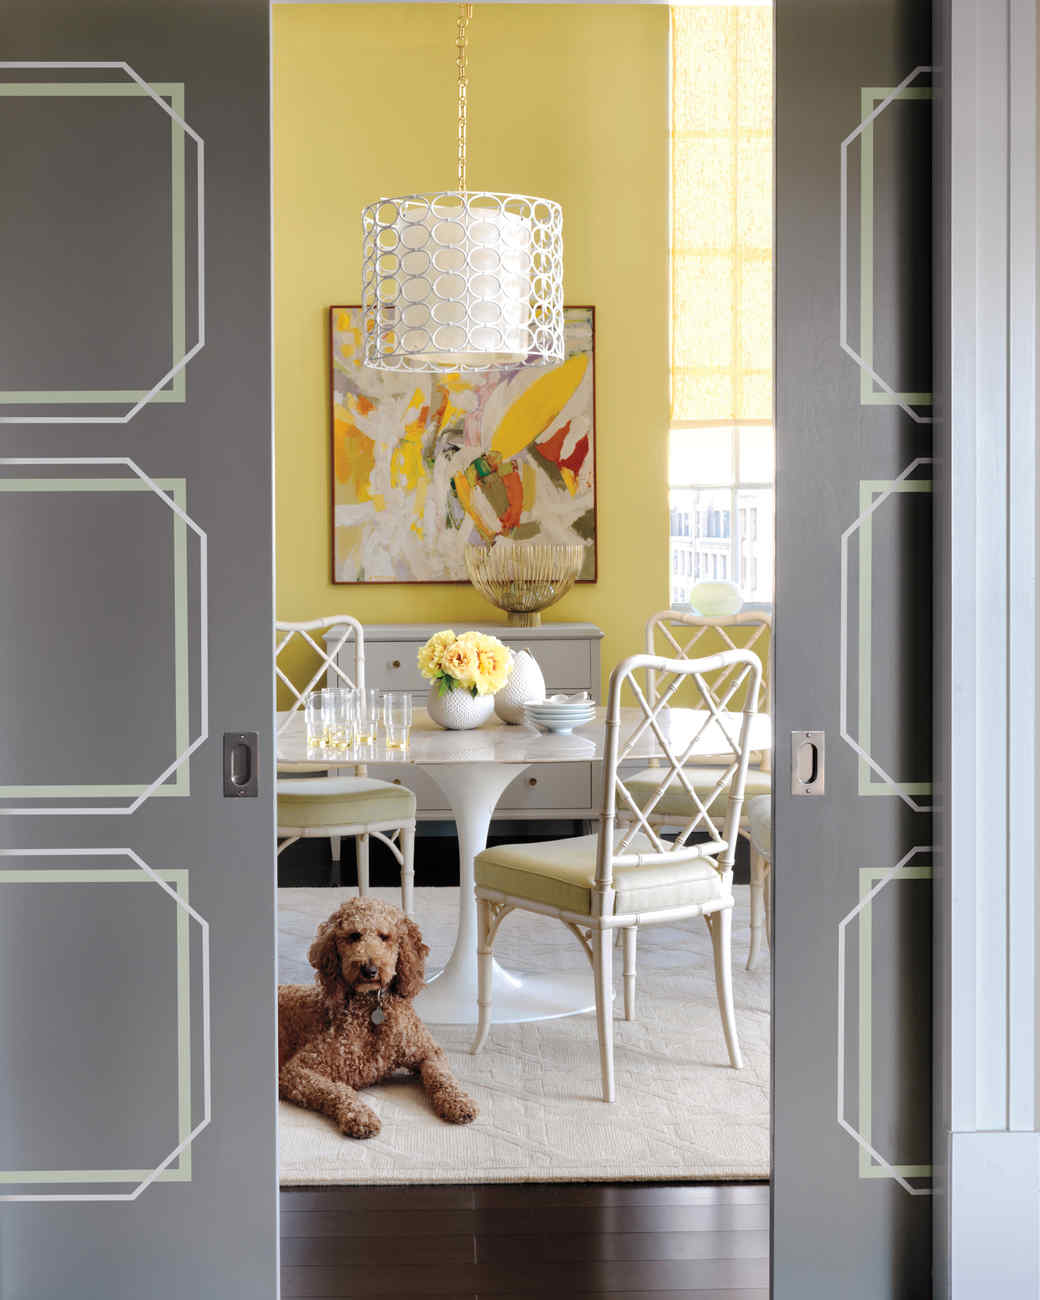 doors-01-0911mld107547.jpg